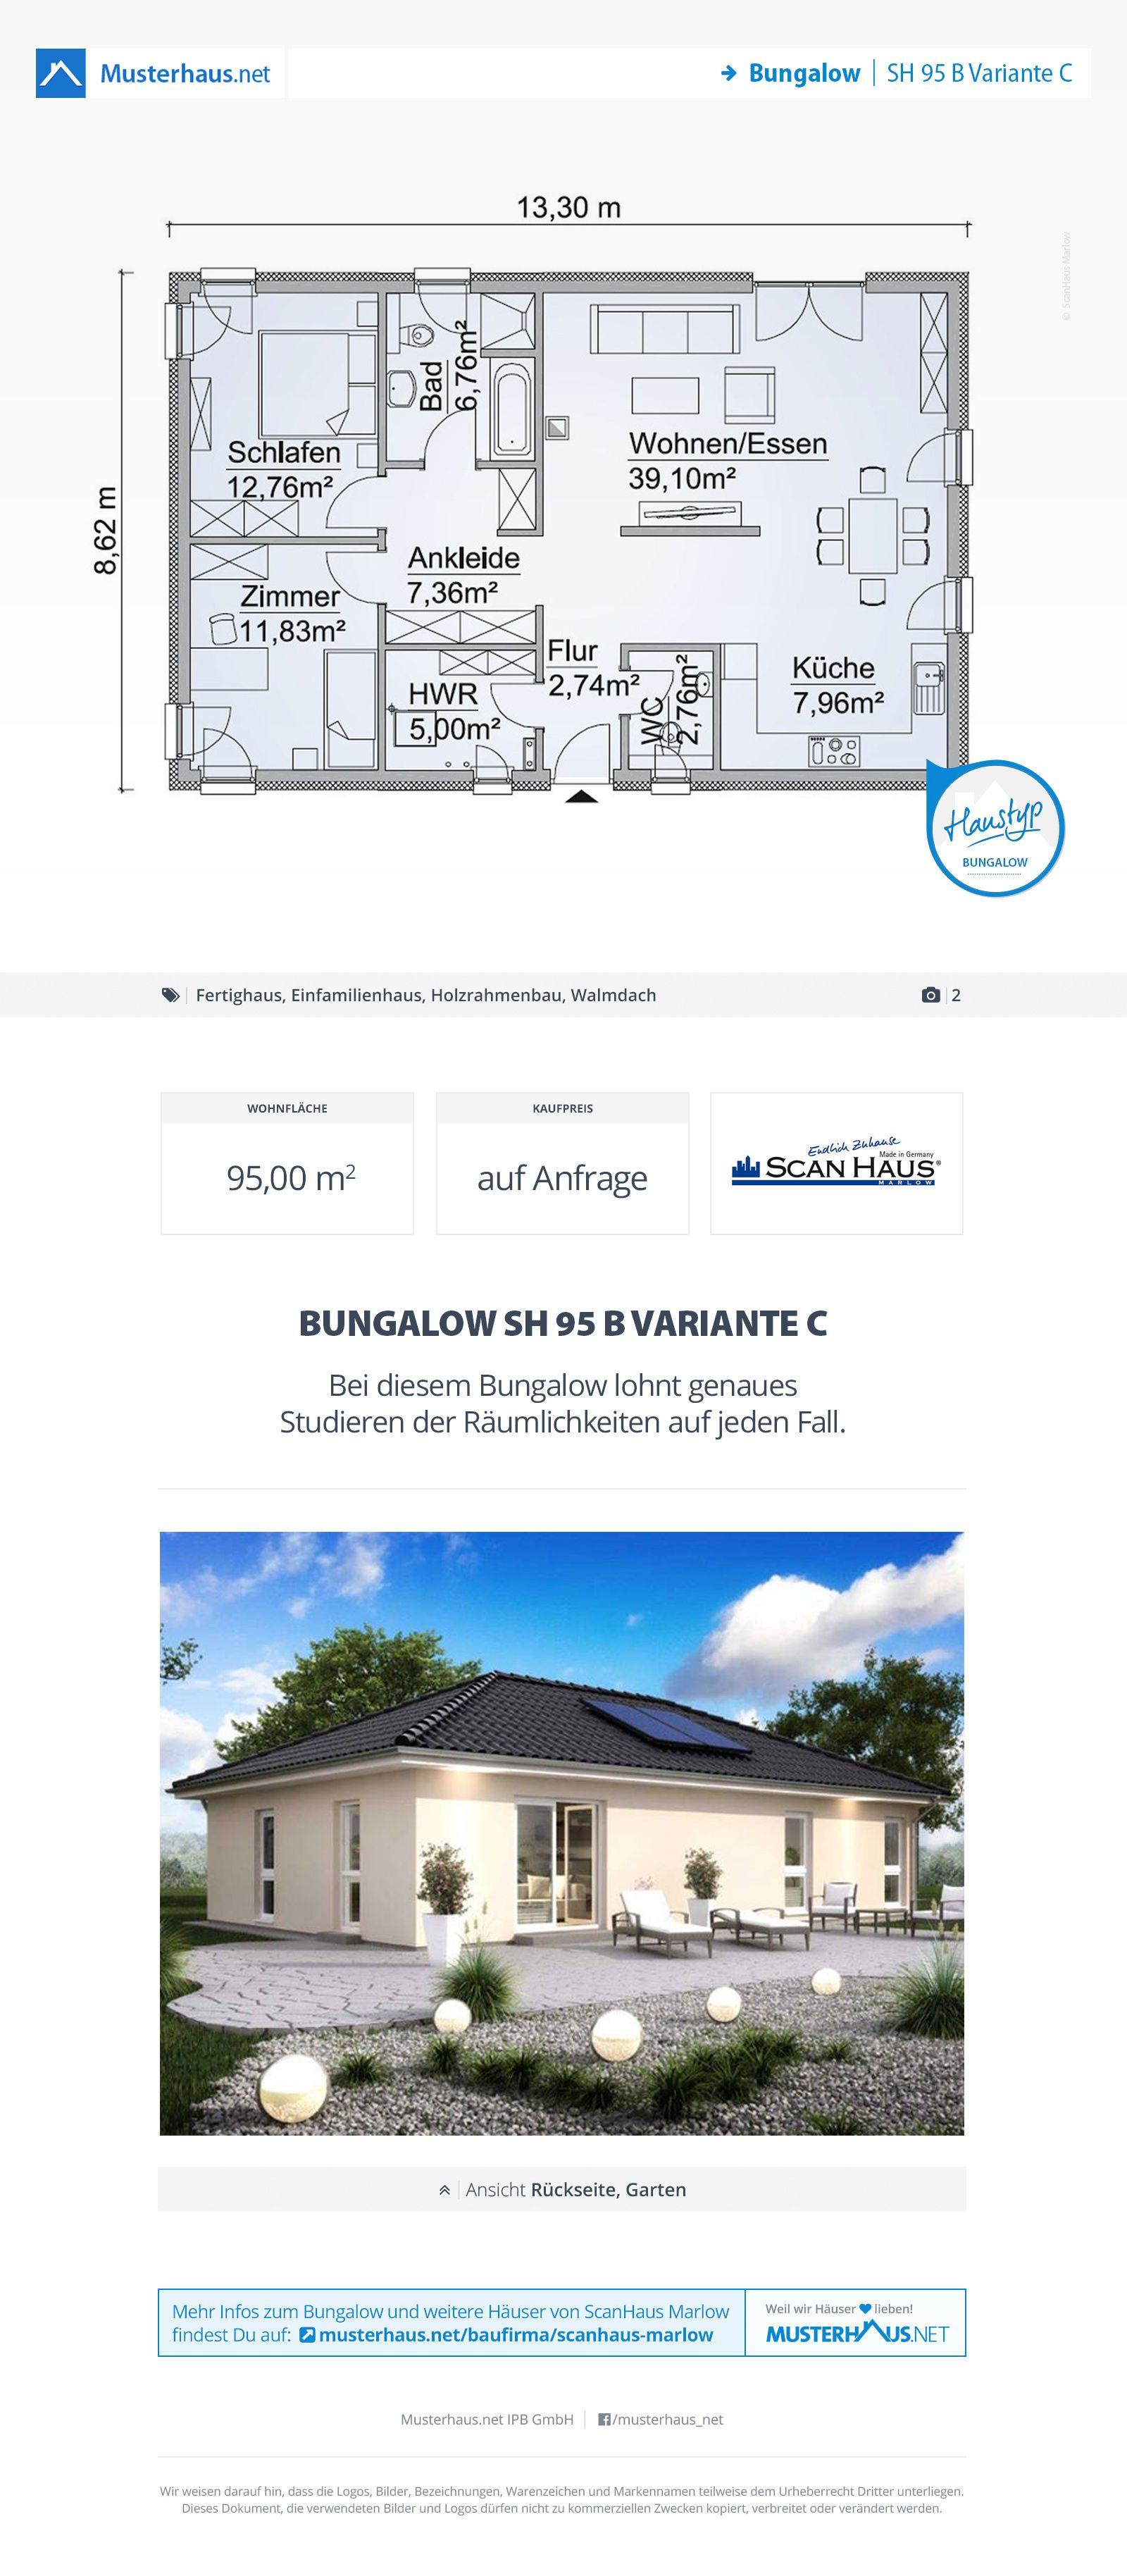 Musterhaus bungalow grundriss  Bungalow, Grundriss, 95 m², Einfamilienhaus, Walmdach | Bungalow ...